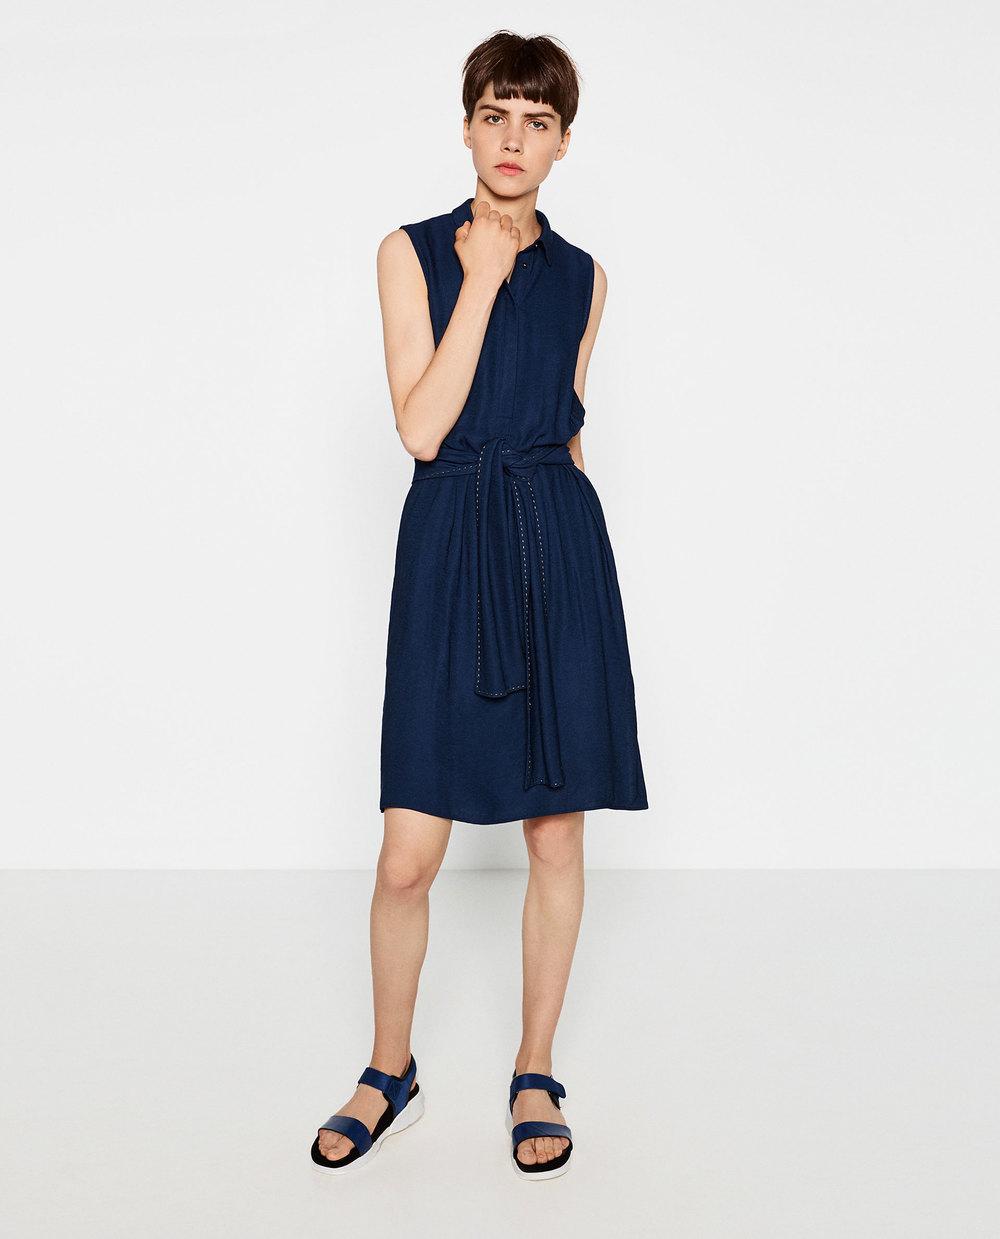 Zara Lace-Up Shirt Dress, $50 at Zara.com.